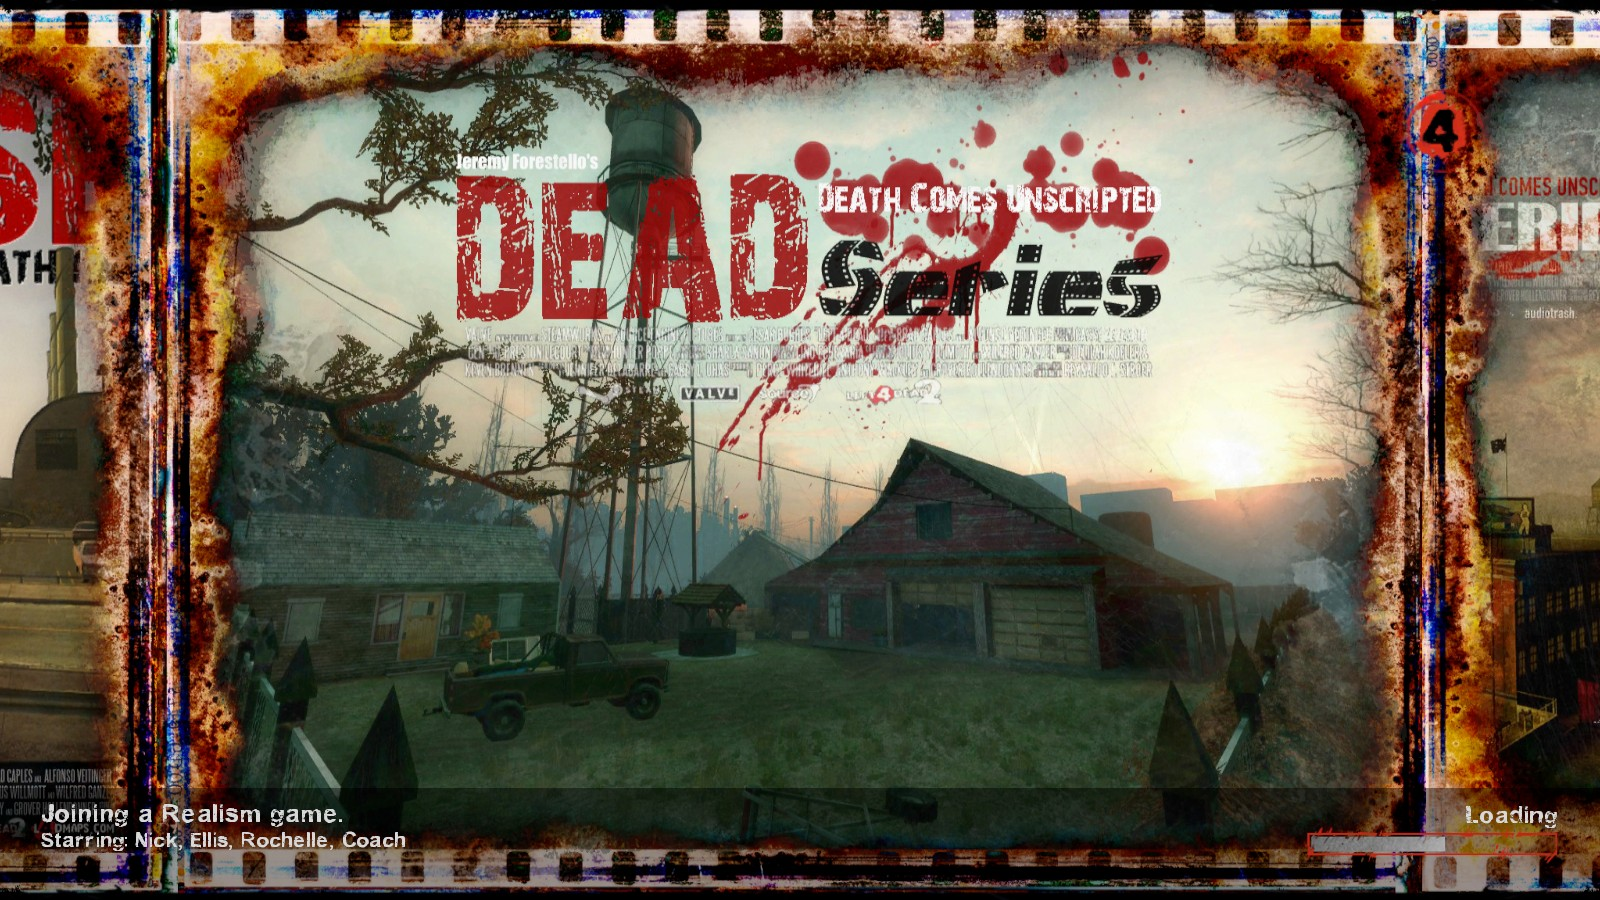 Steam Community :: Guide :: Top 50 Left 4 Dead 2 Custom Campaigns